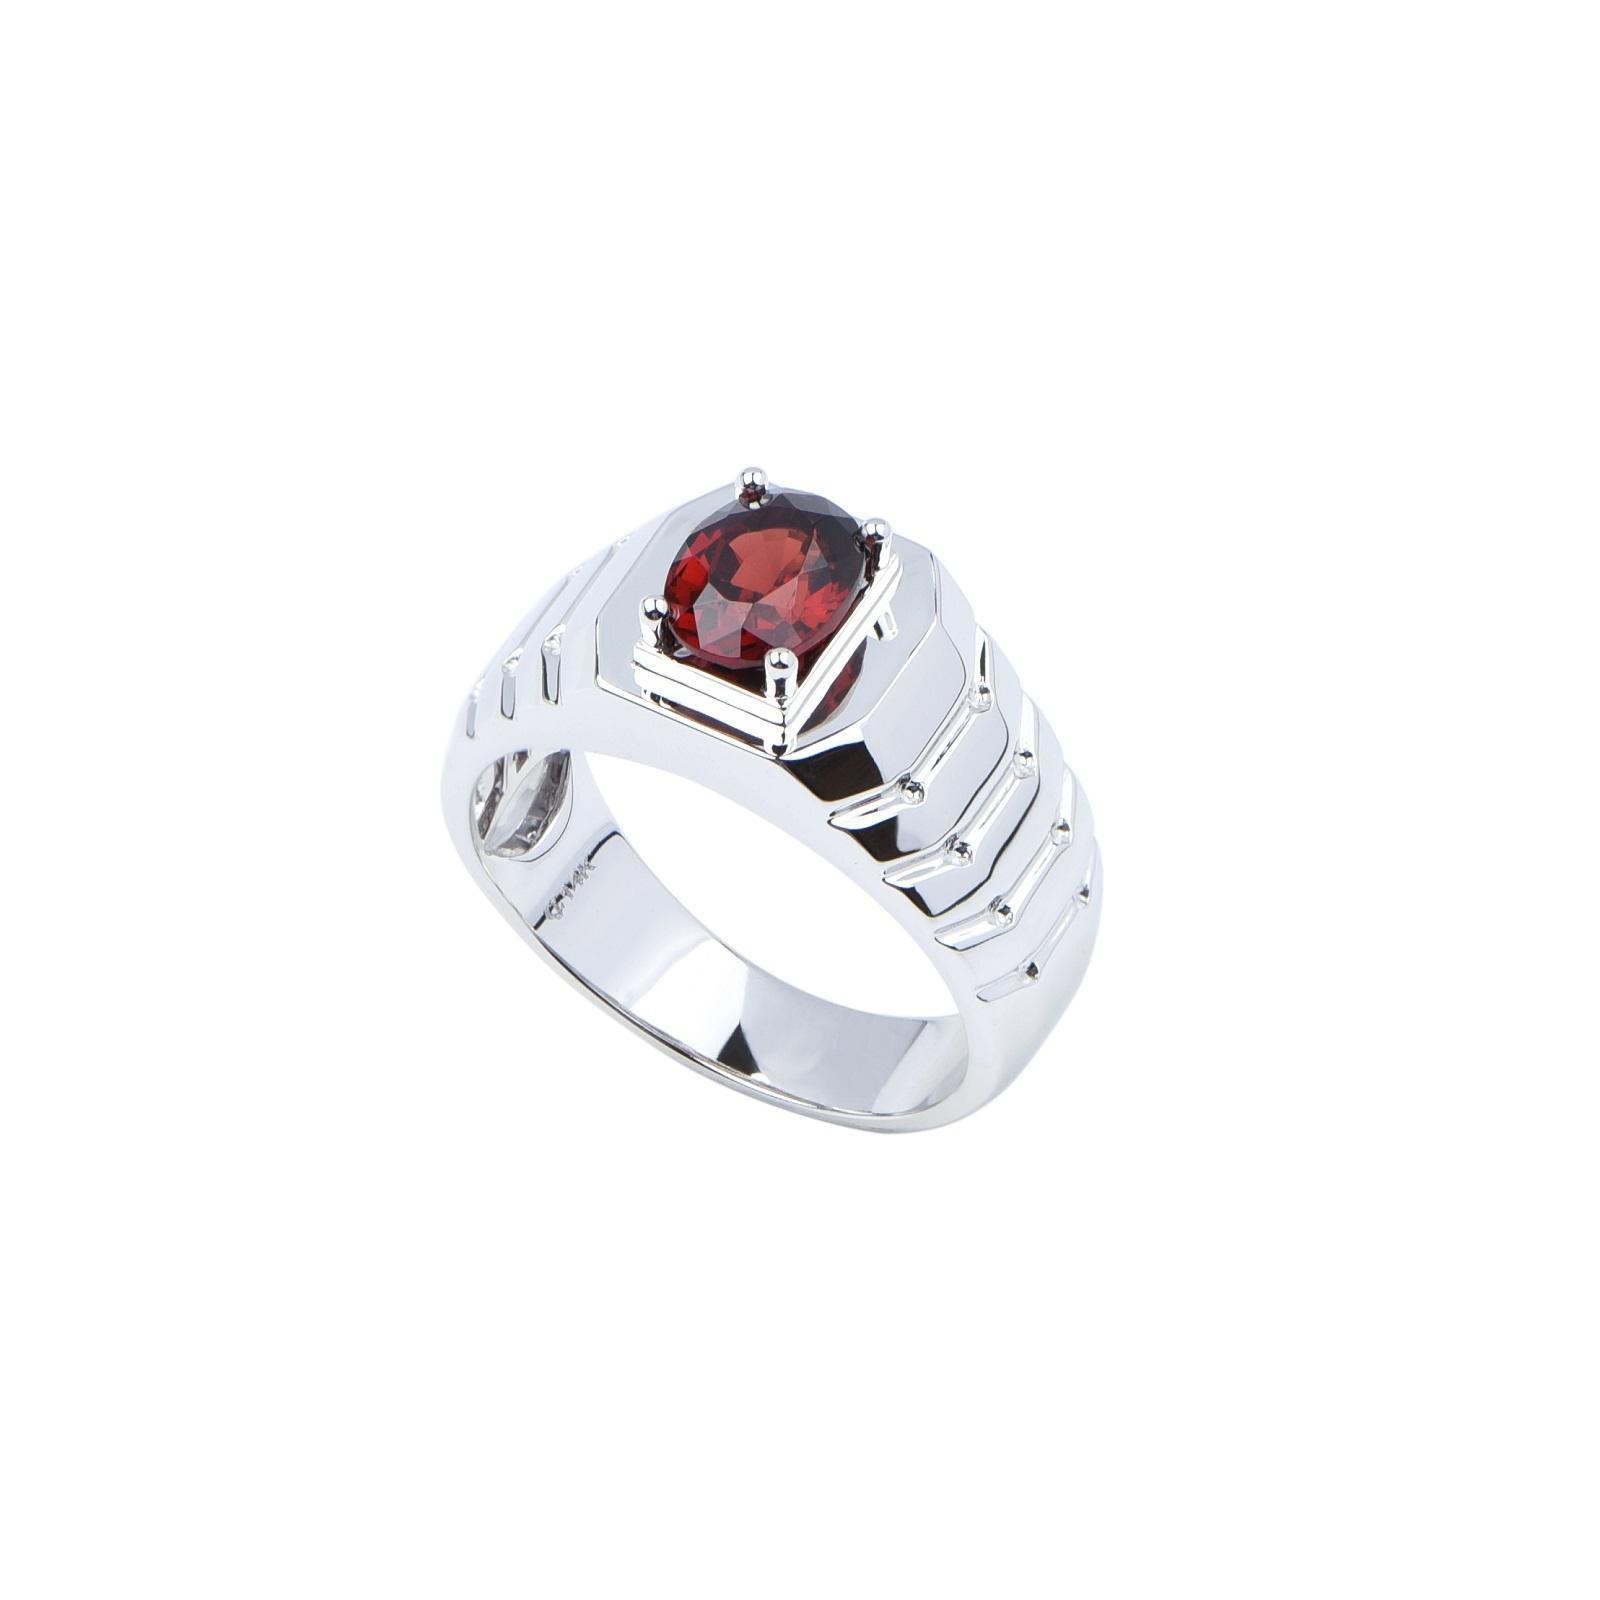 Nhẫn nam đá Garnet 21NN029